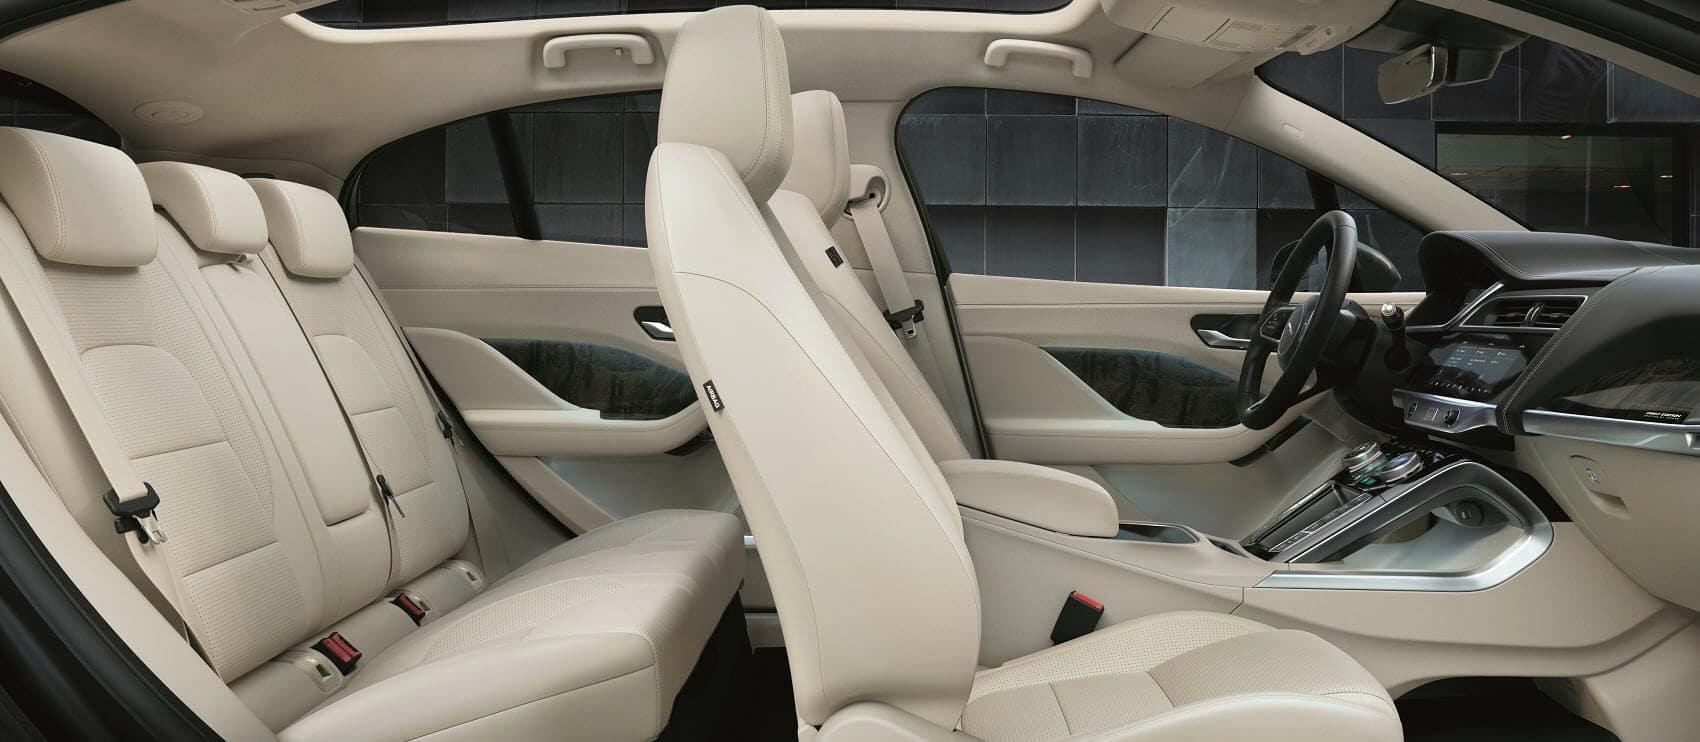 2019 Jaguar I-PACE Interior Review